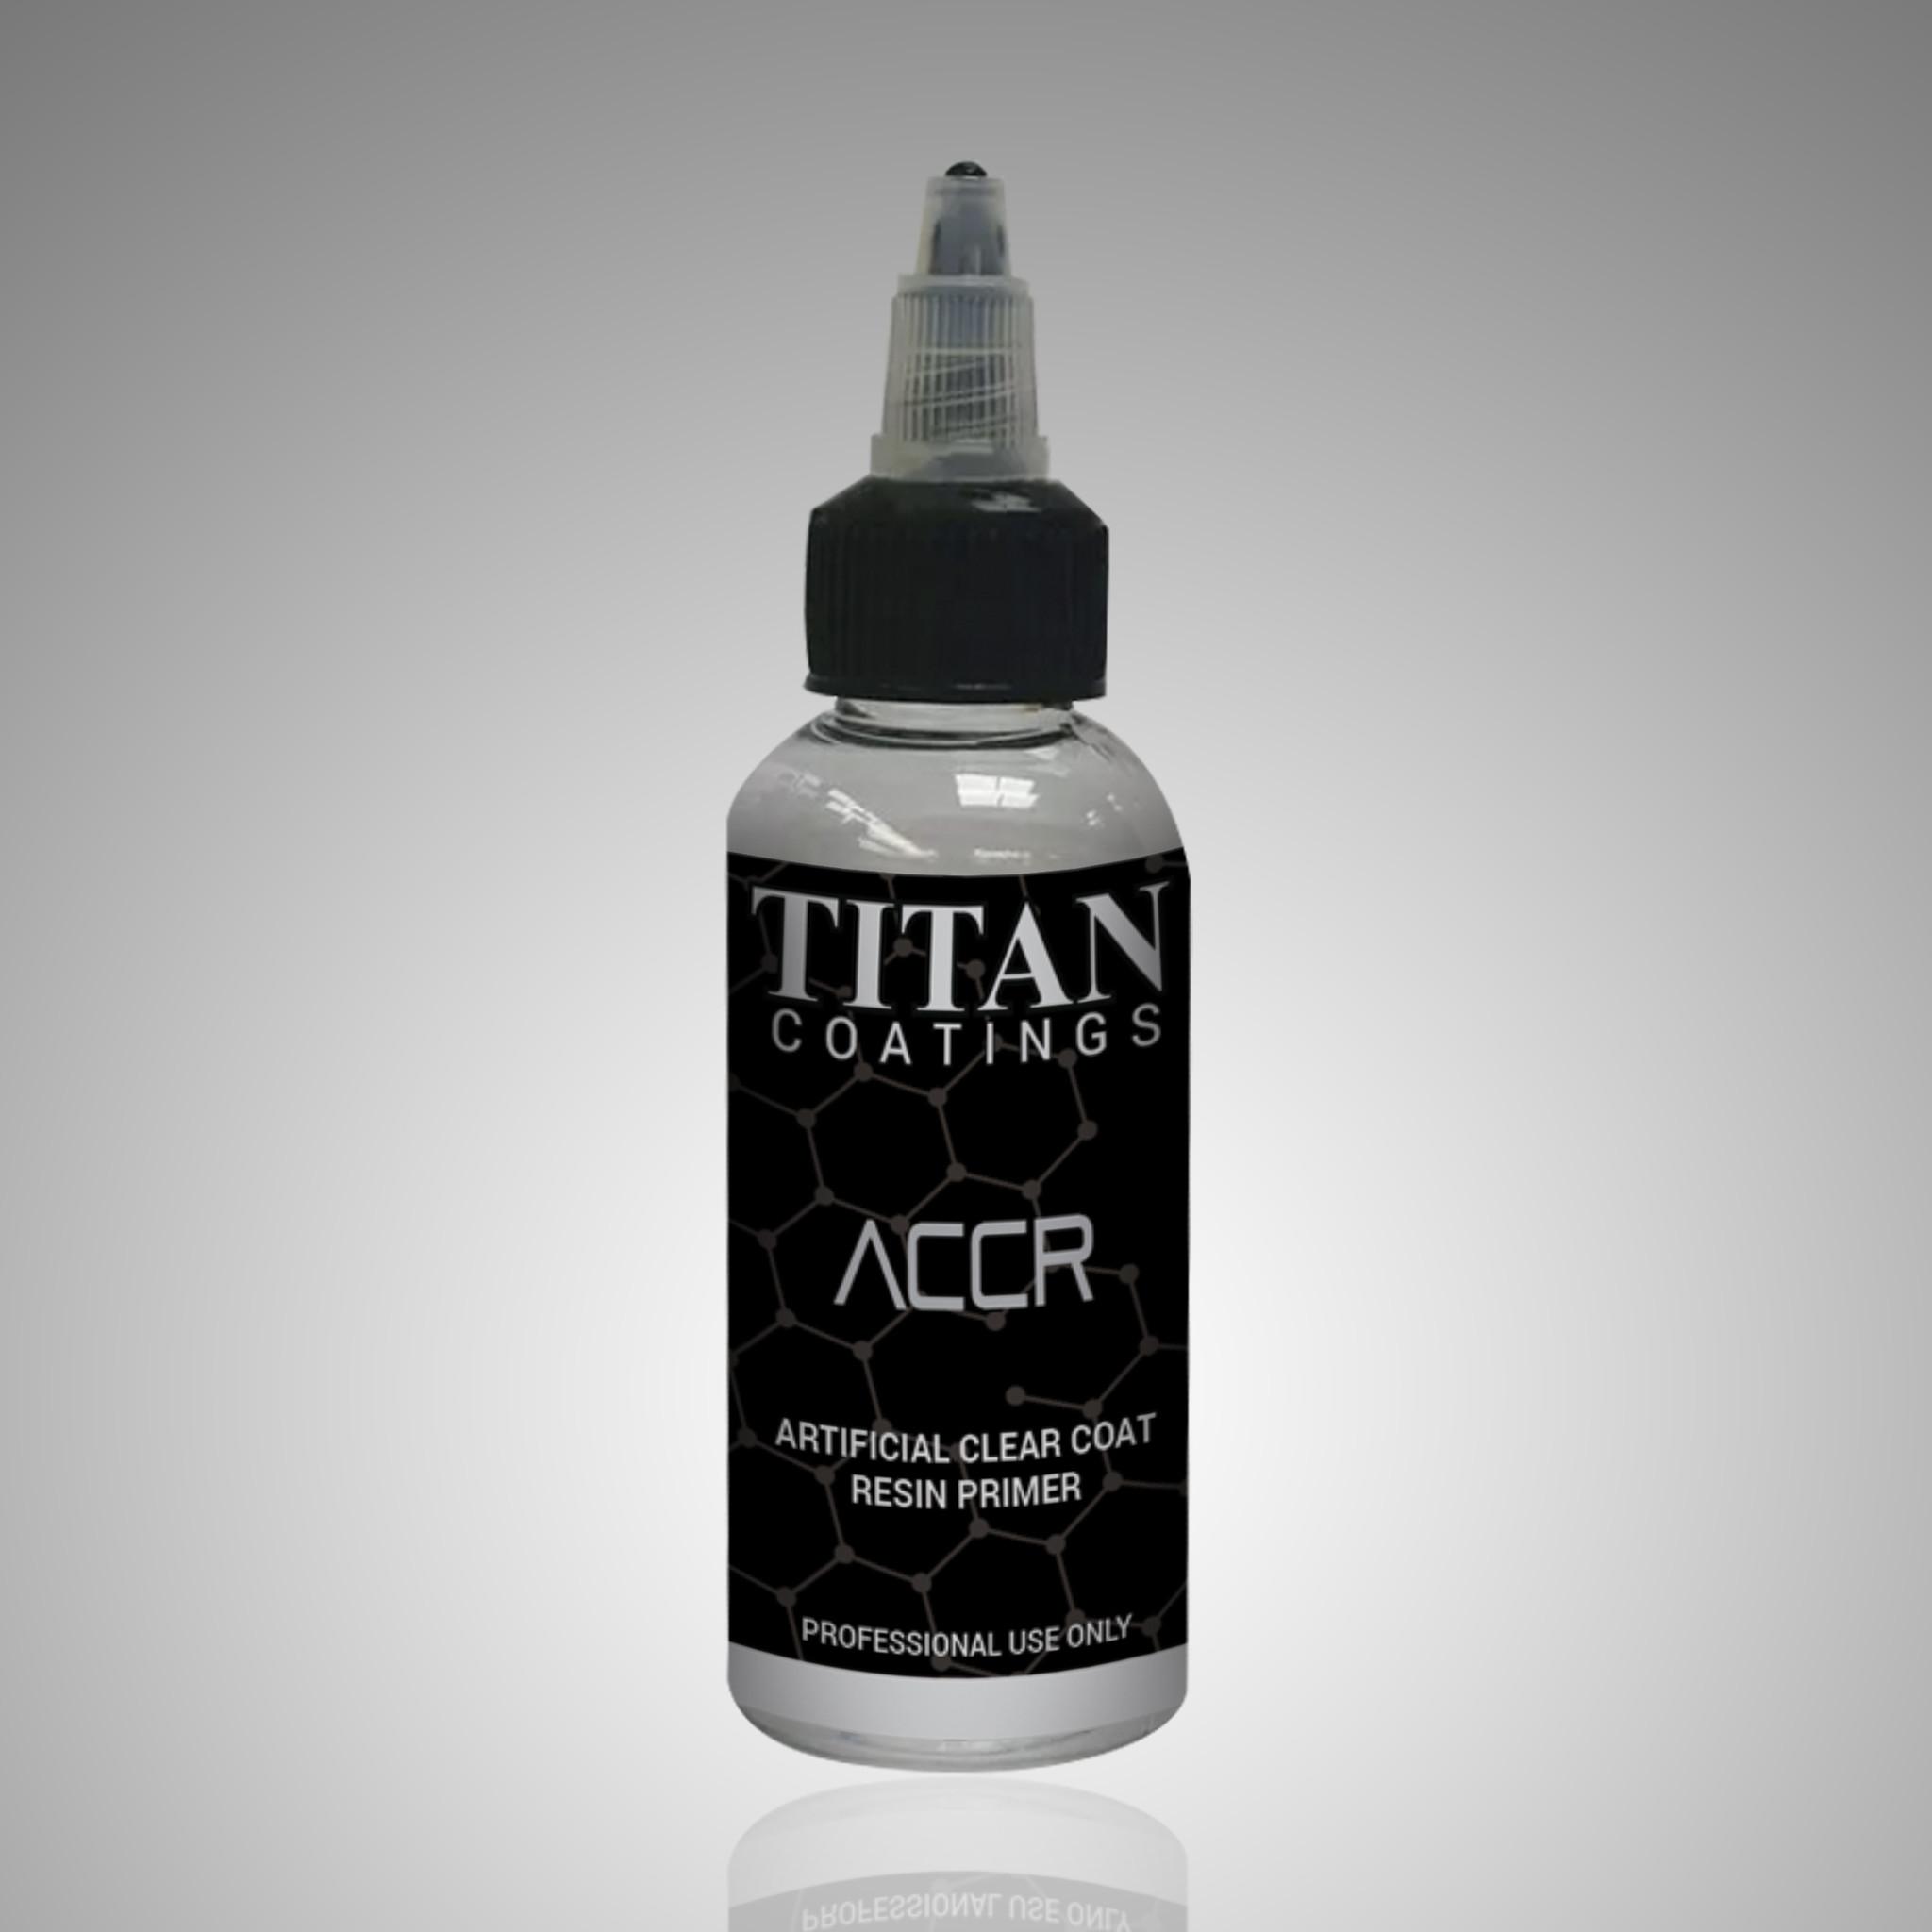 Titan Coatings UK ACCR Primer 100ml